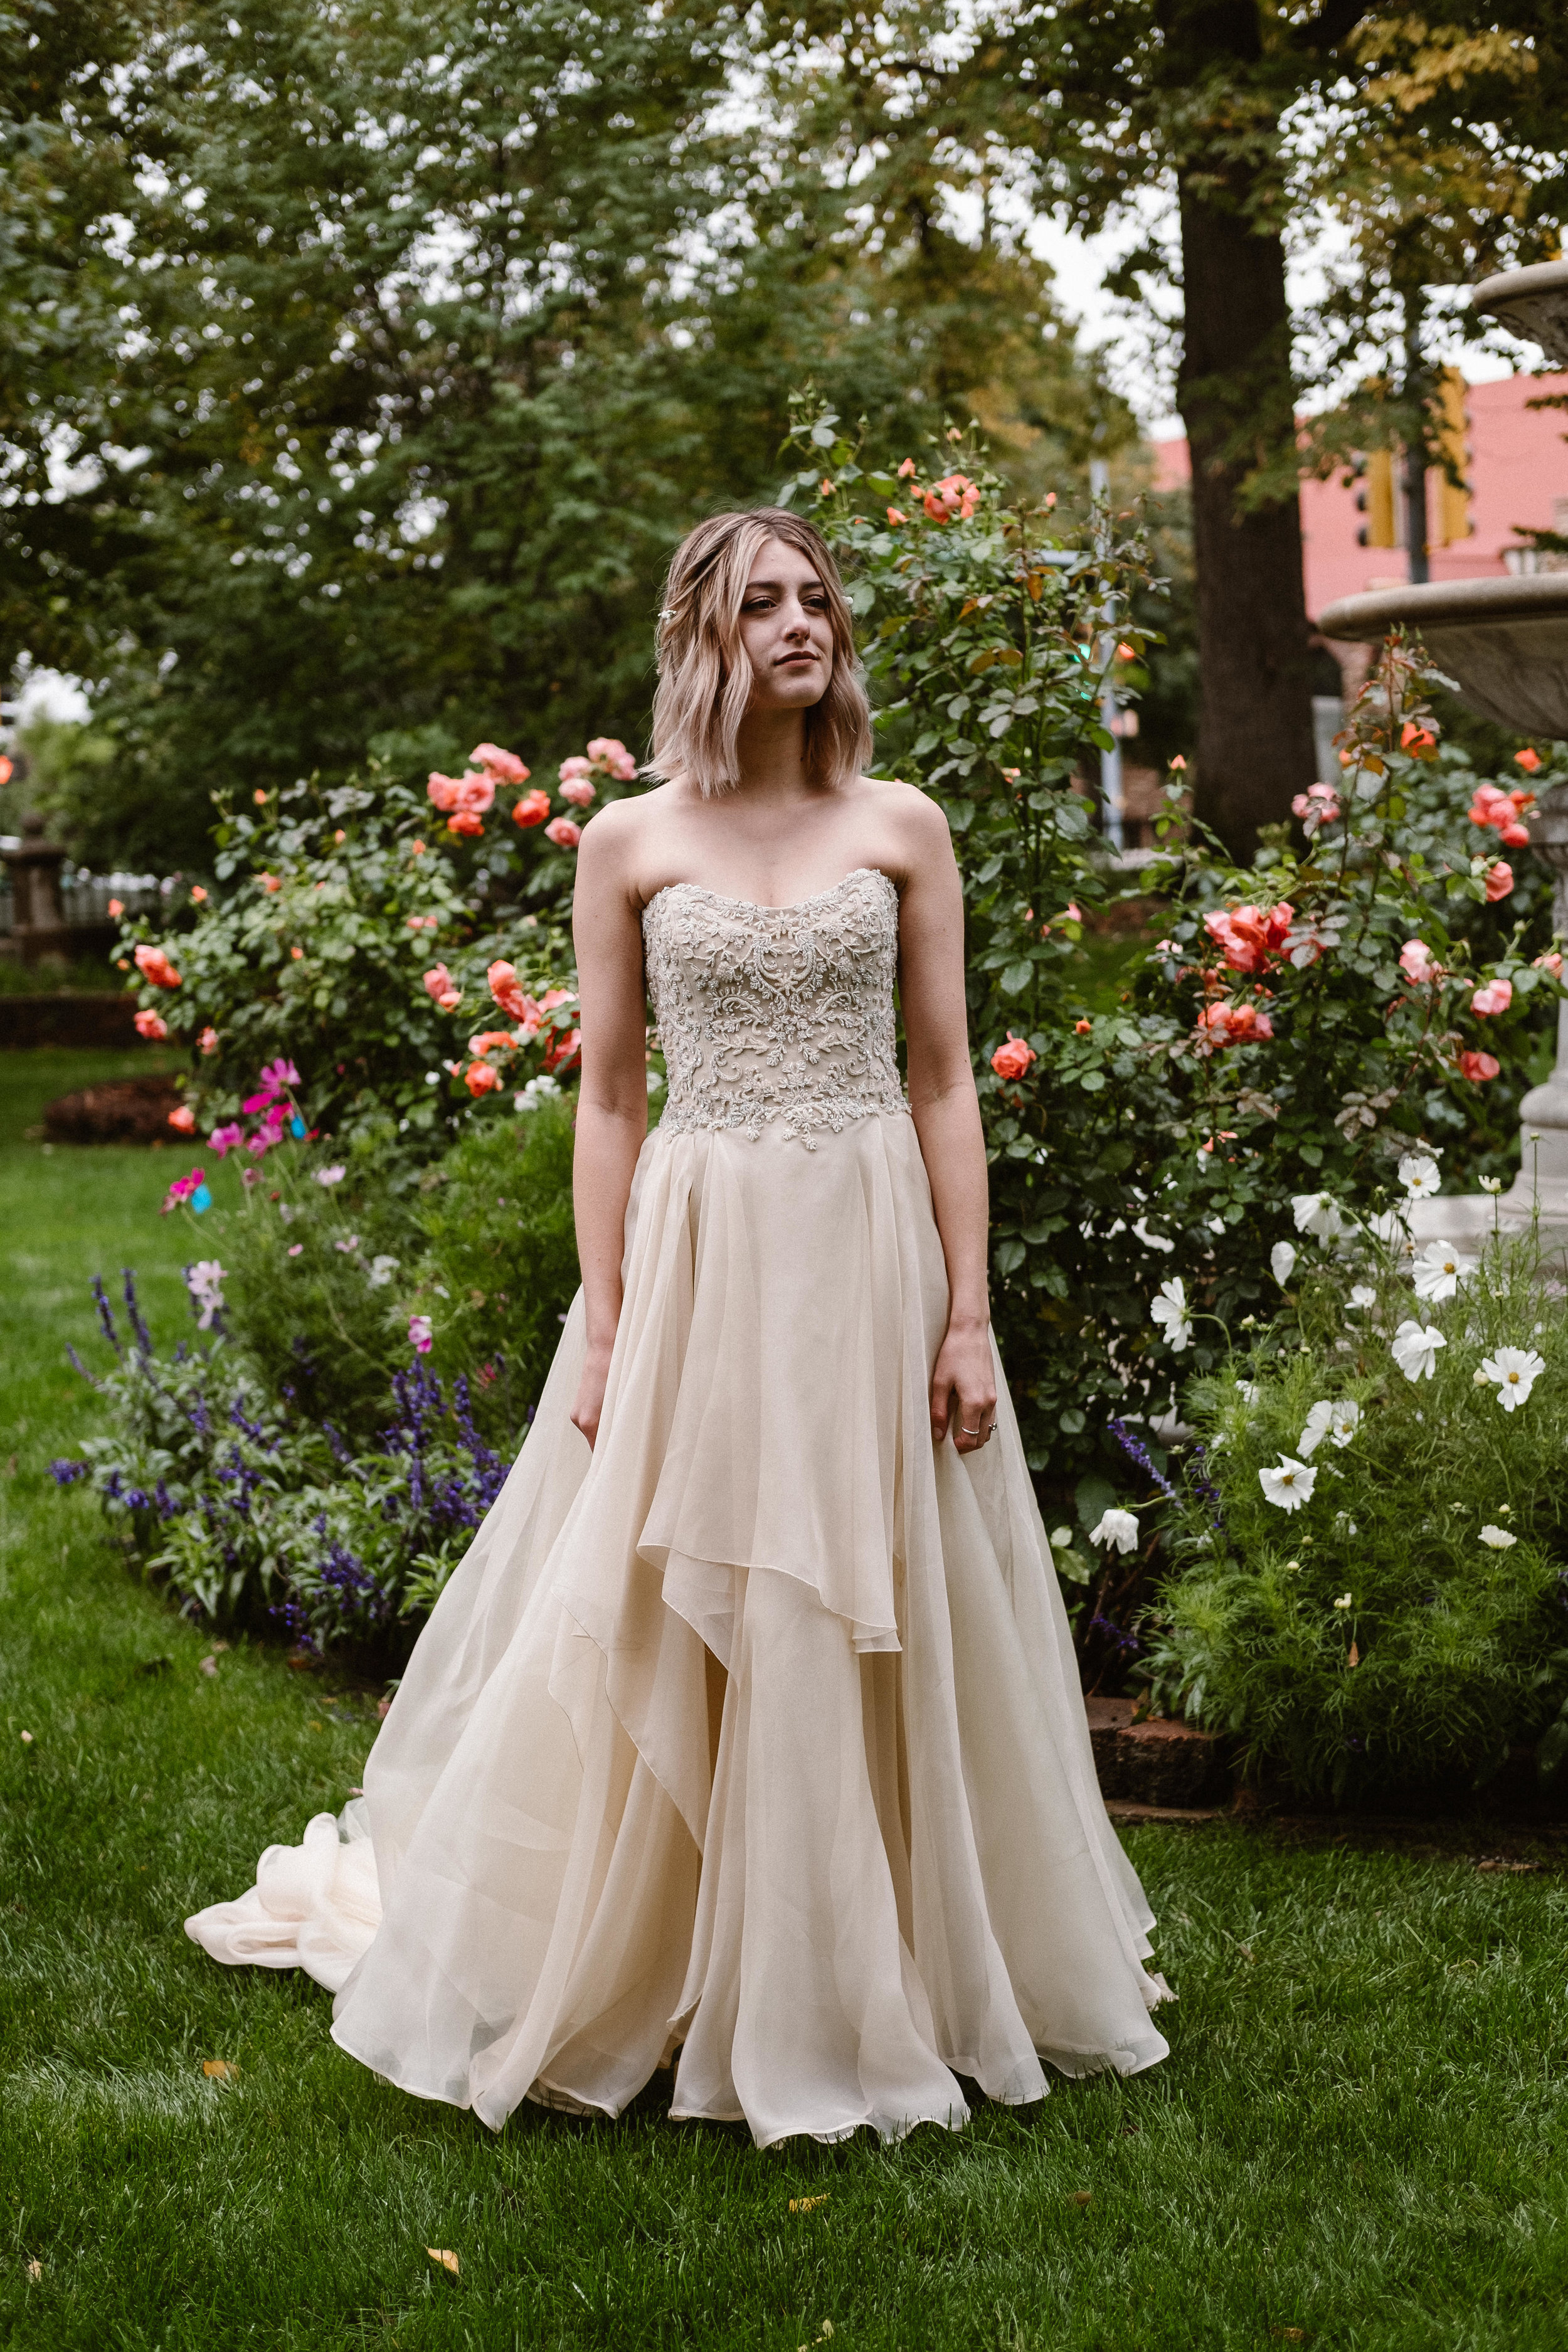 Little White Dress Bridal Shop Flash Sale, Little White Dress Bridal Shop Denver, Sample Sale Dresses Denver CO, Off The Rack Wedding Dresses, Marchesa Denver CO